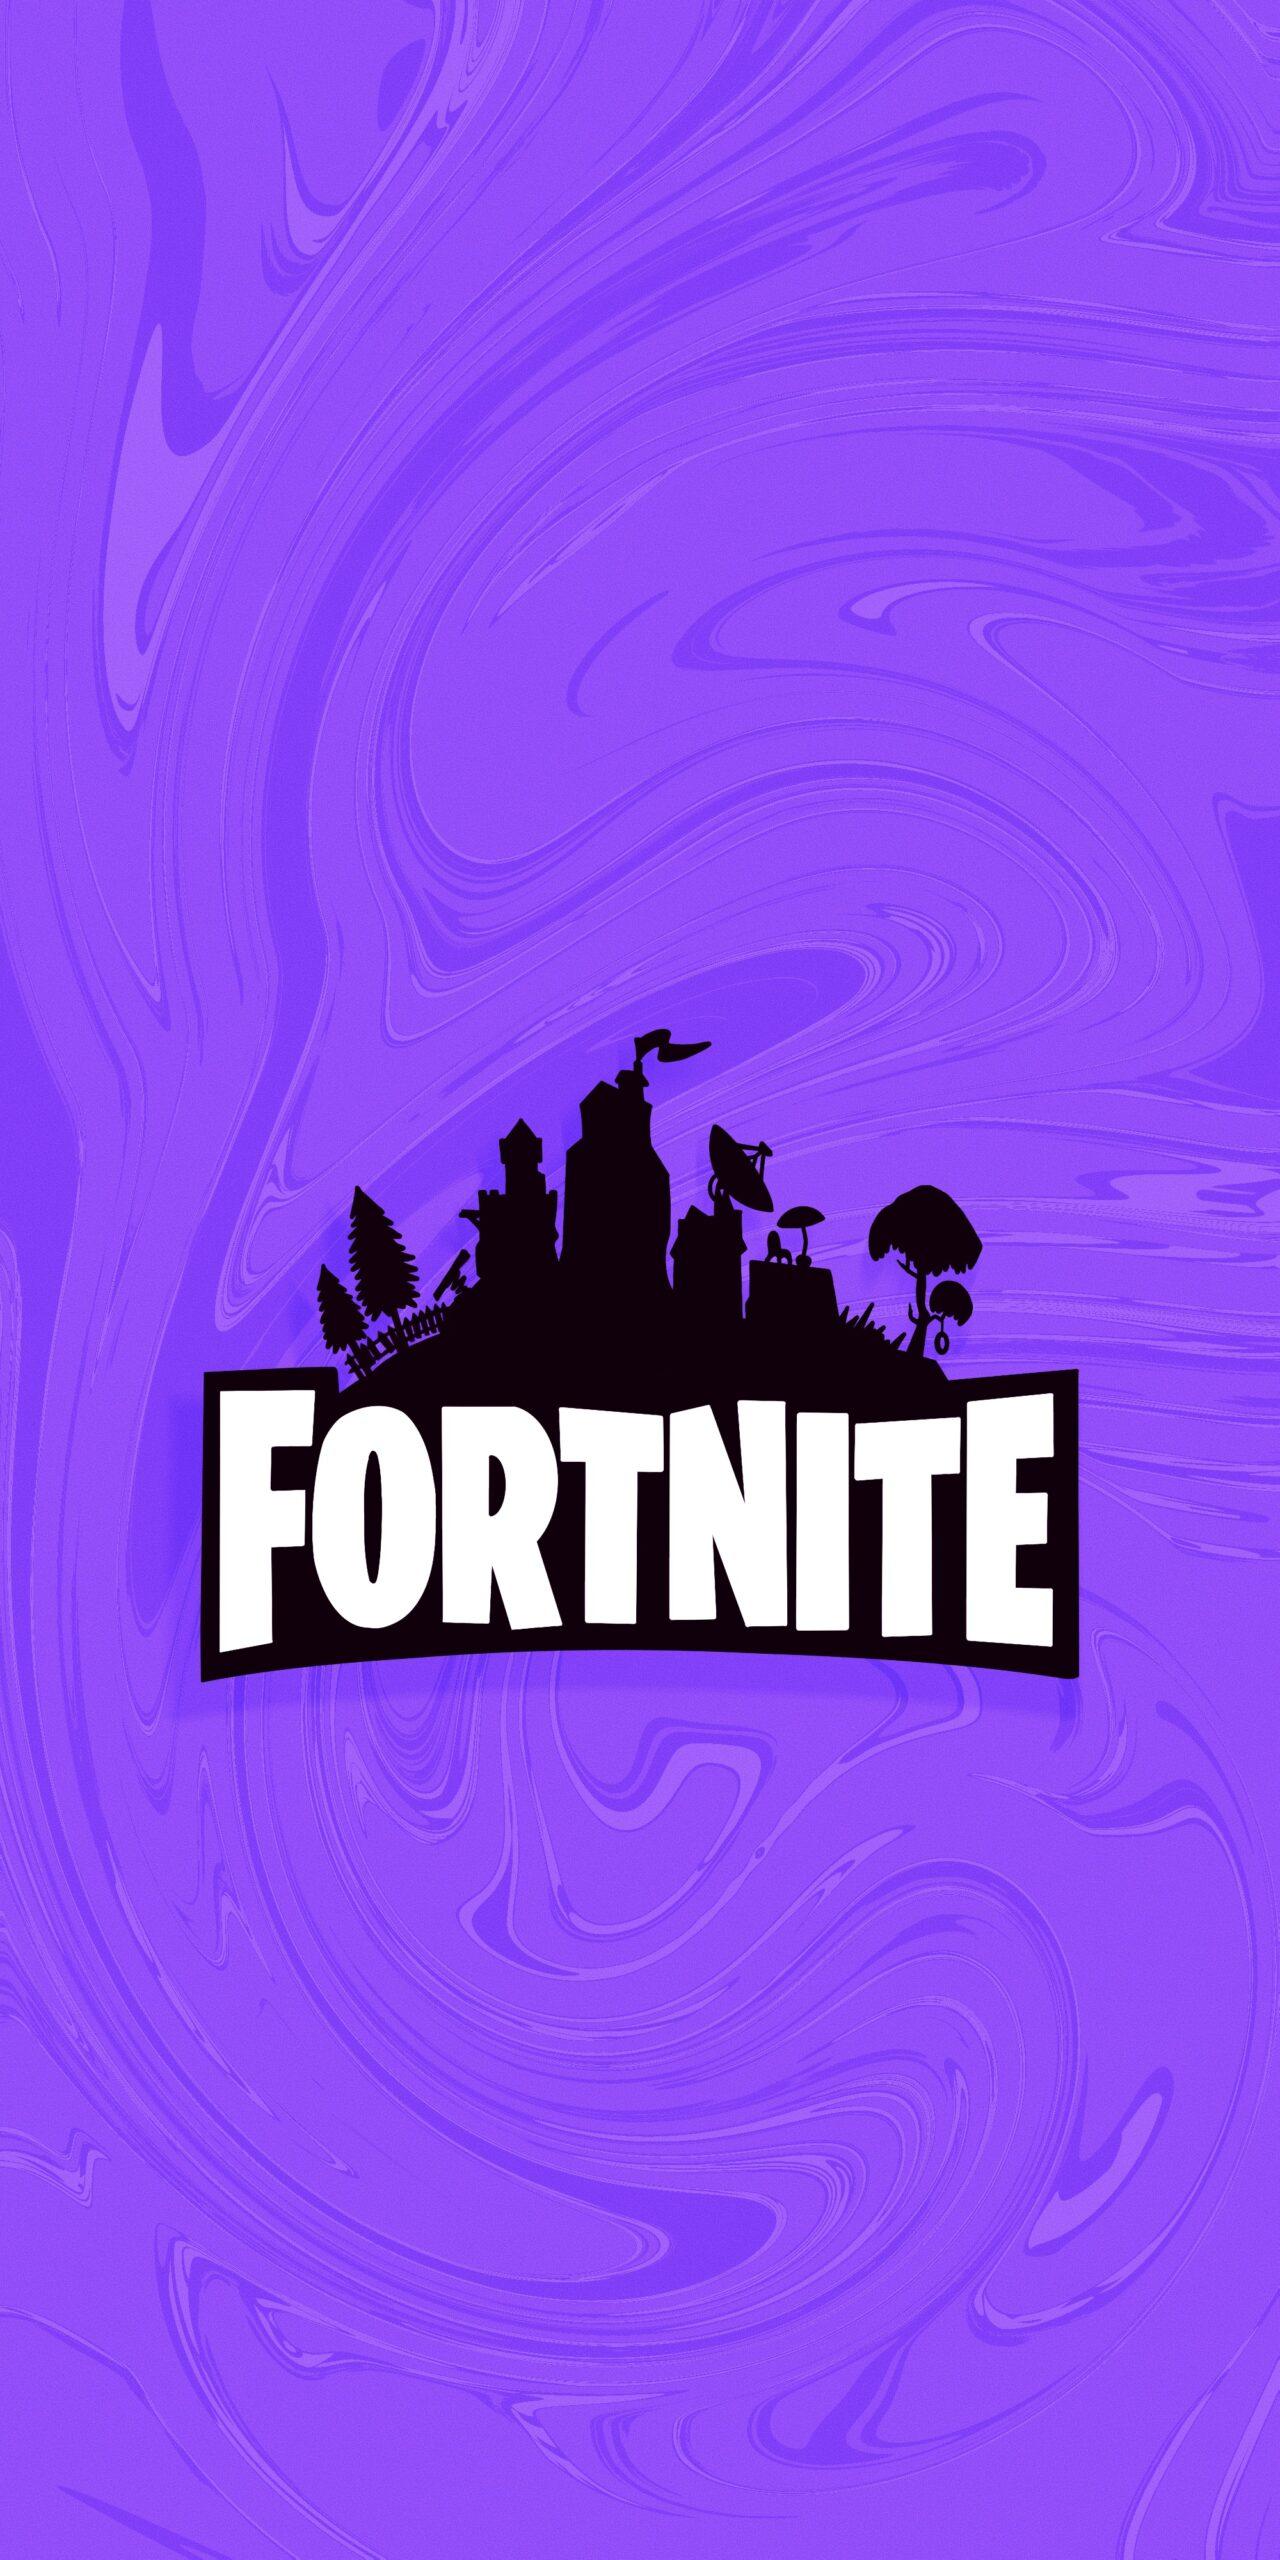 fortnite logo purple wallpaper